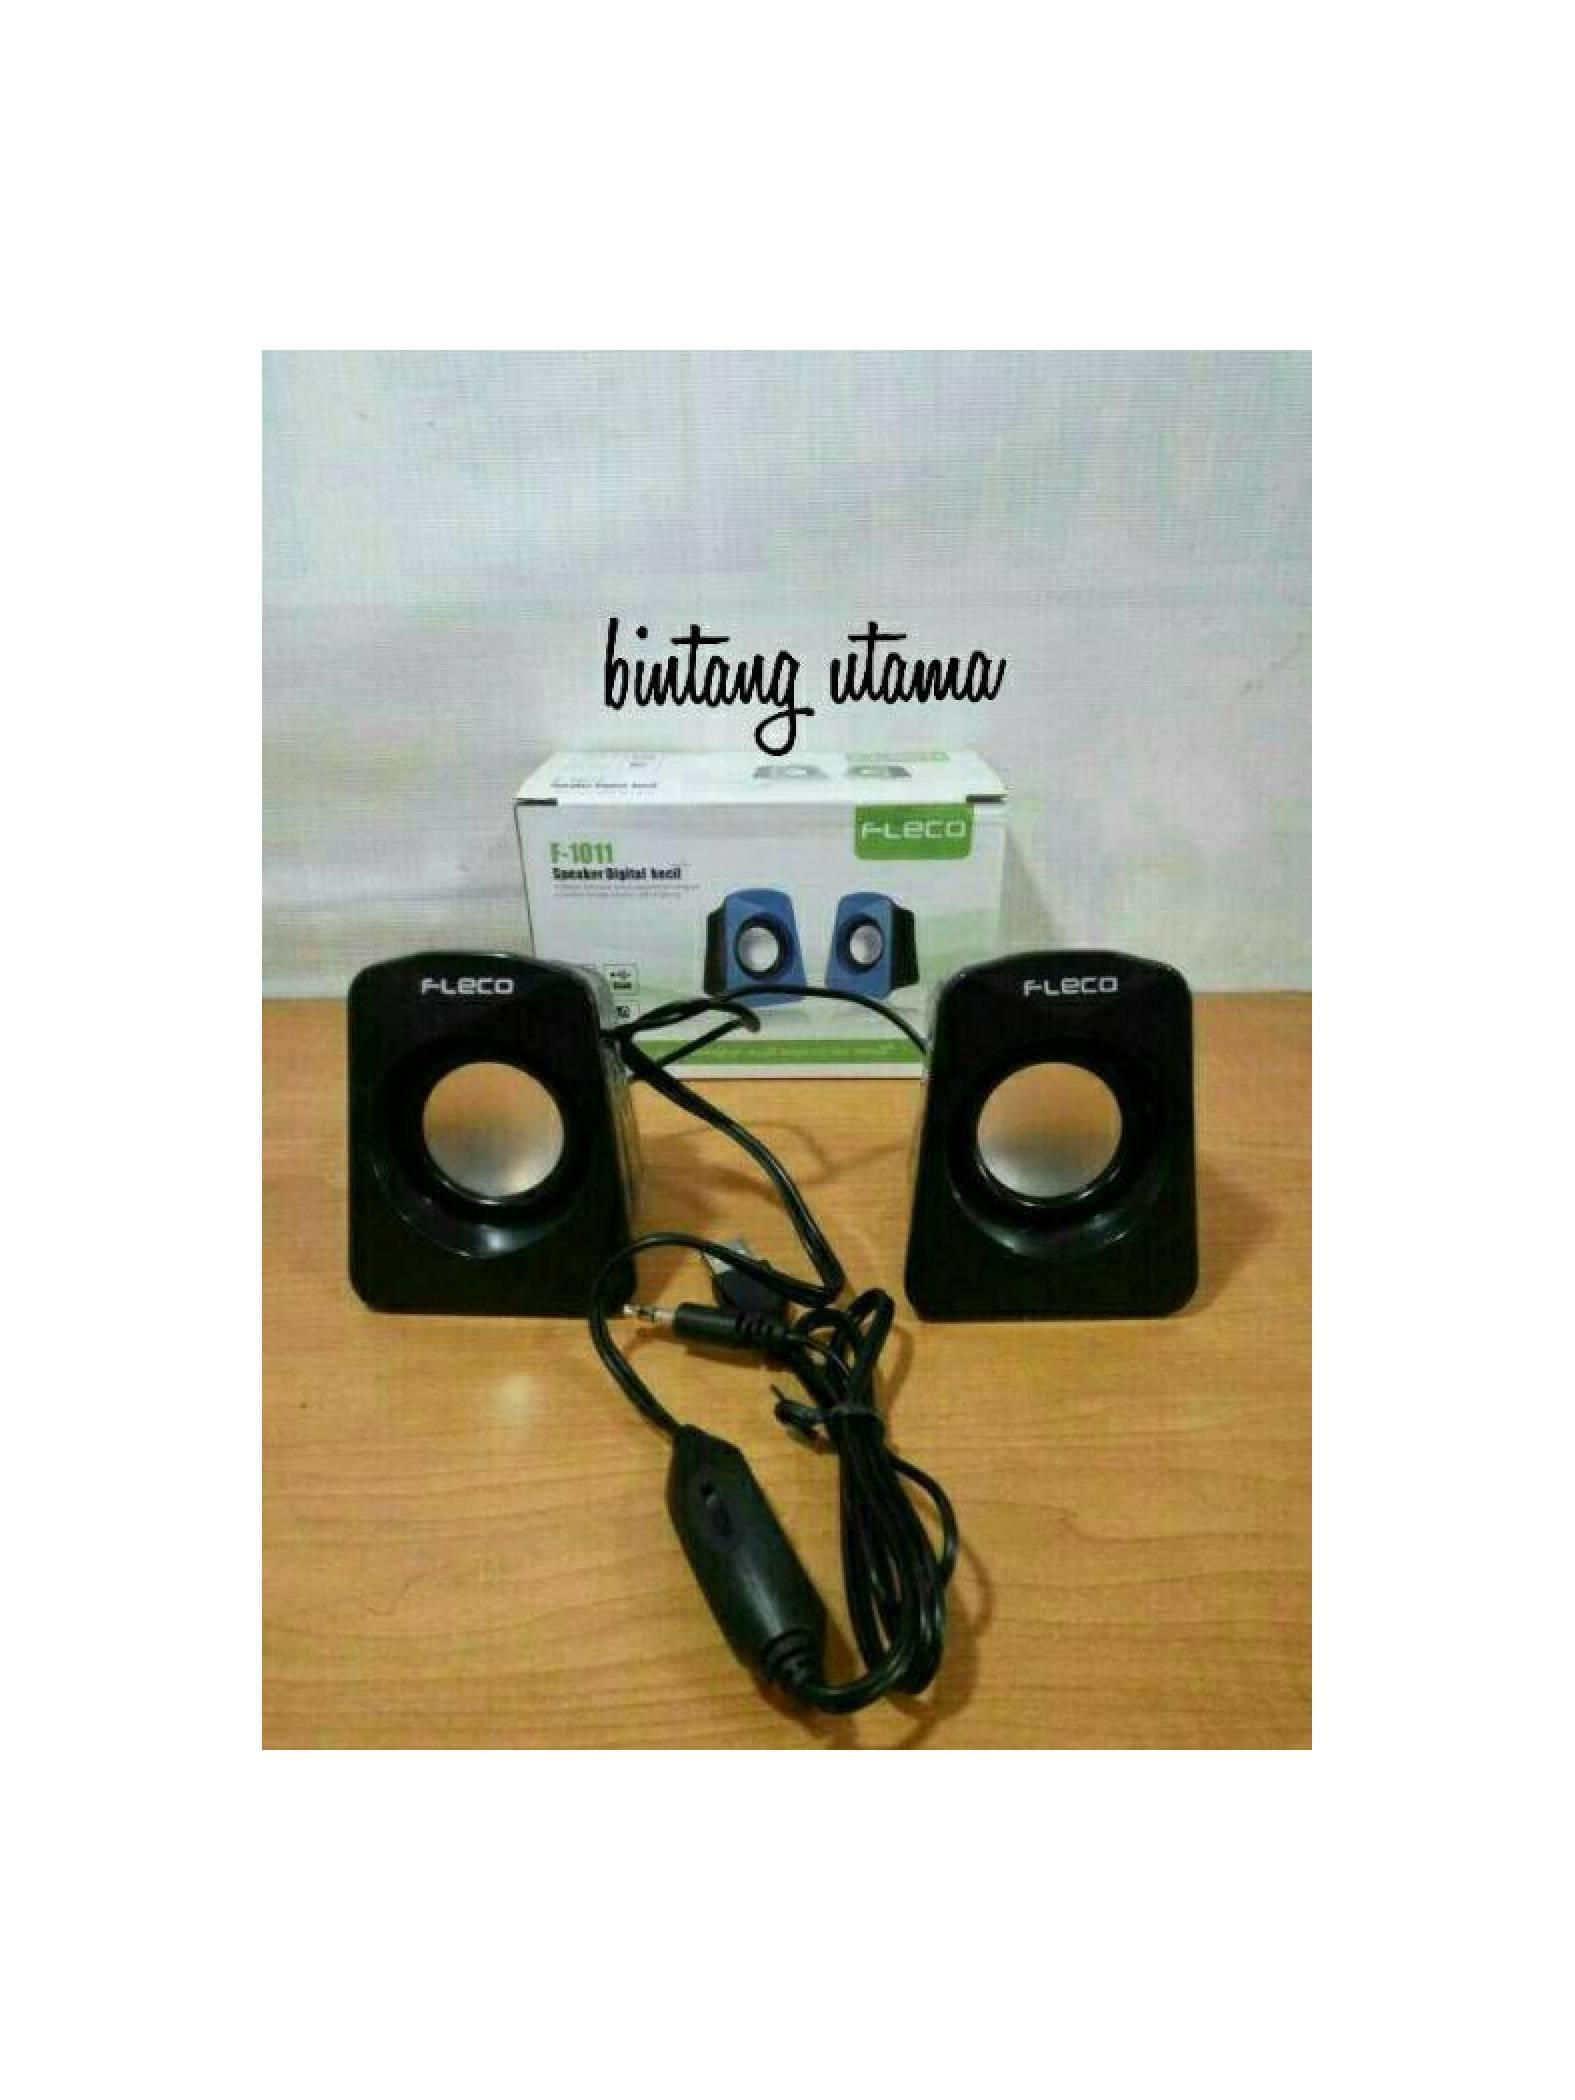 Kelebihan Speker Box Bluetooth Mr D Hd Quality Sepeker Dengan Suara Speaker Mini Kulitas Komputer Murah Kualitas Ok